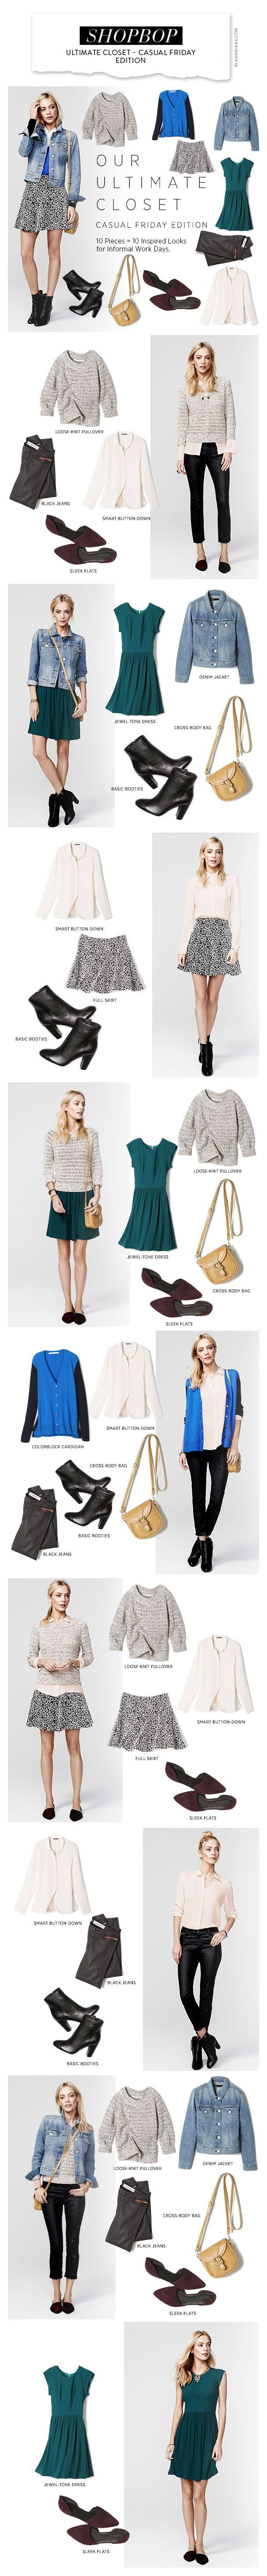 Shopbop: Ultimate Closet – Casual Friday Edition